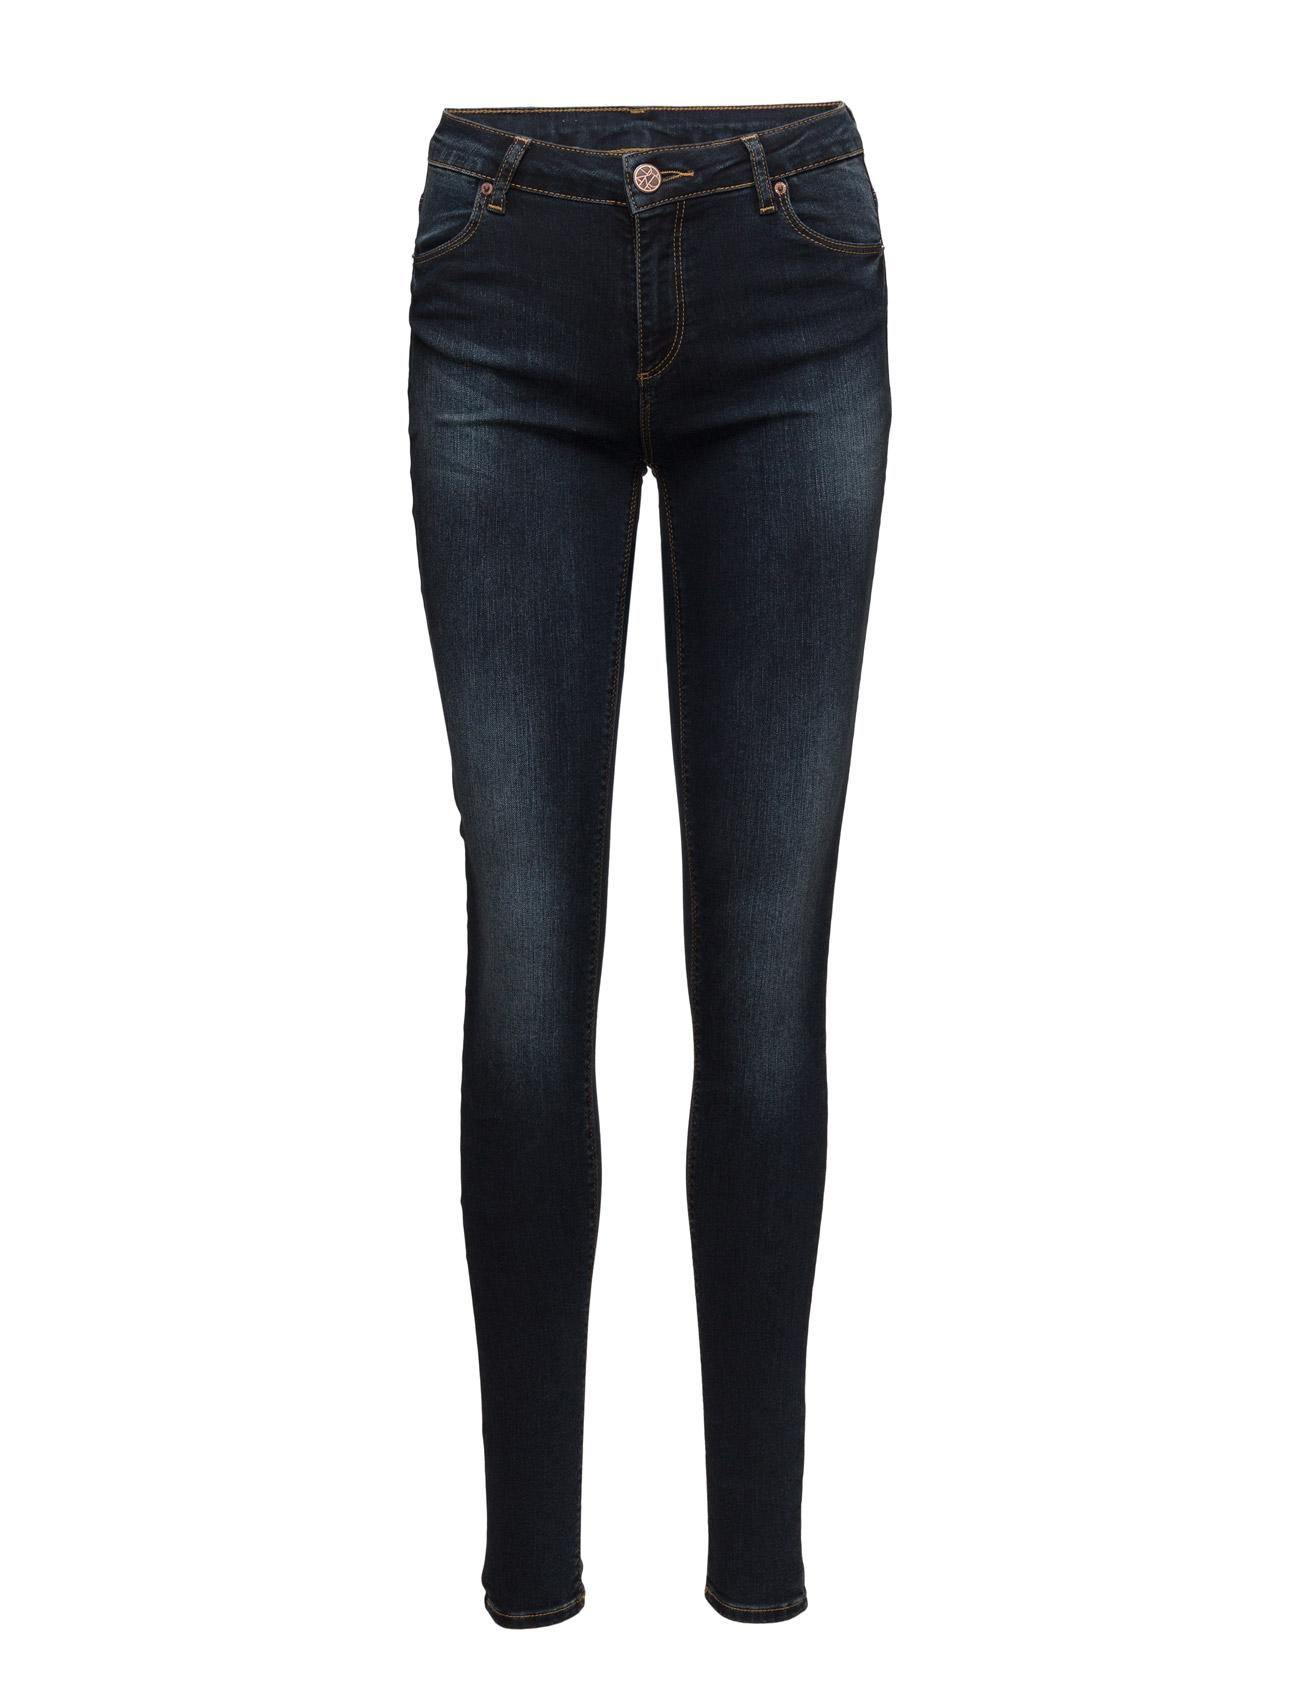 Nicole 014 Blue Midnight, Jeans 2nd One Skinny til Damer i